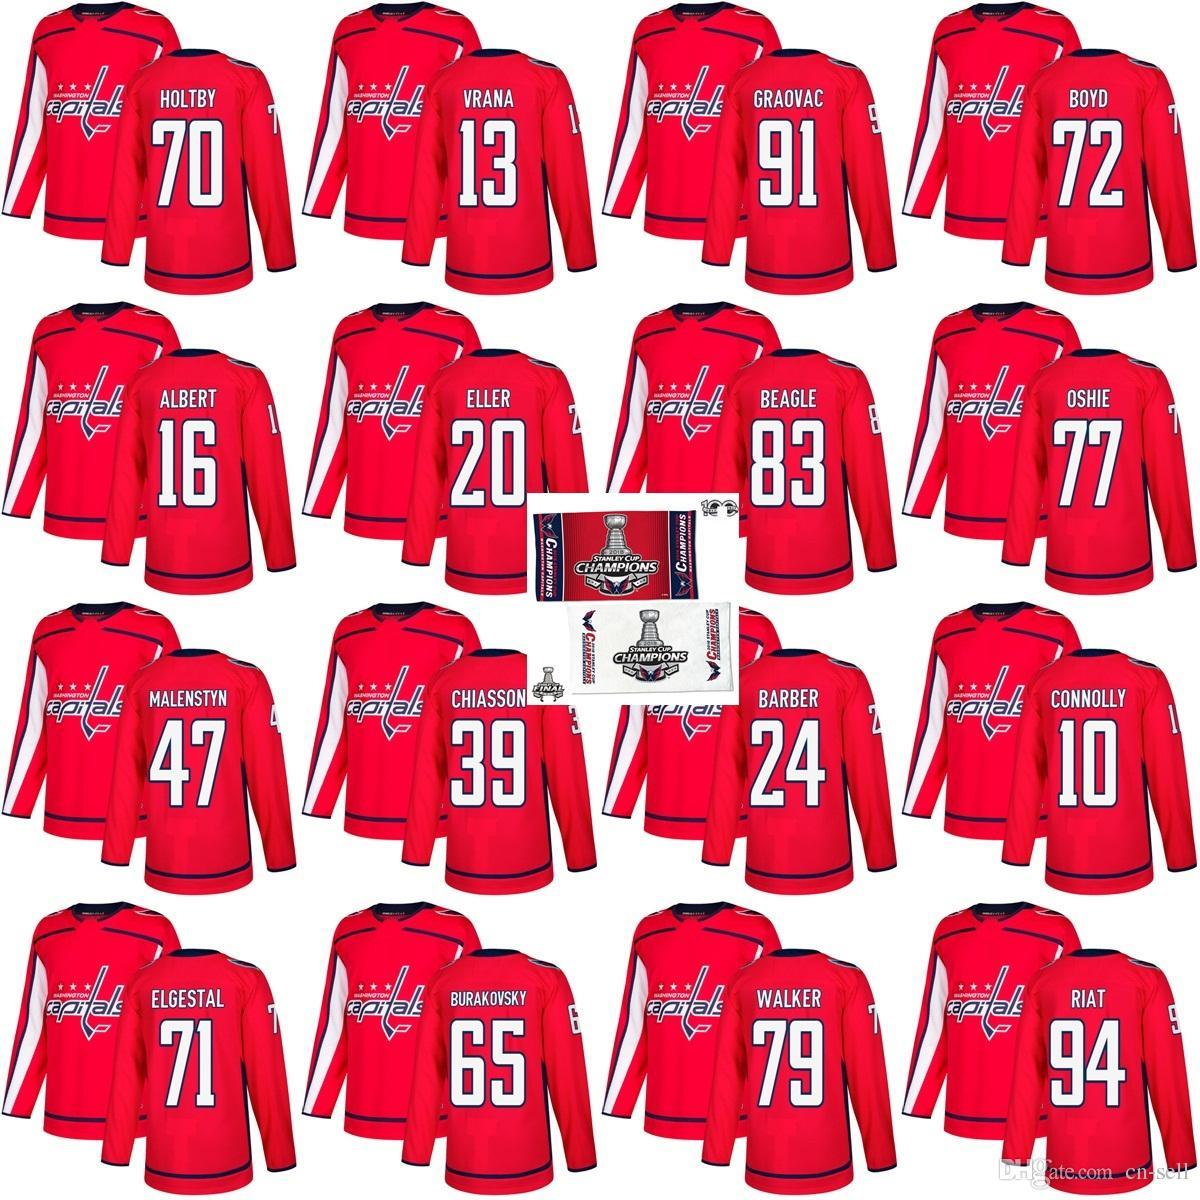 8752d6626 2018 2018 Stanley Cup Final Champion Patch T.J. Oshie 70 Braden Holtby  Jakub Vrana 91 Graovac Travis Boyd Washington Capitals Hockey Jerseys Red  From Cn ...